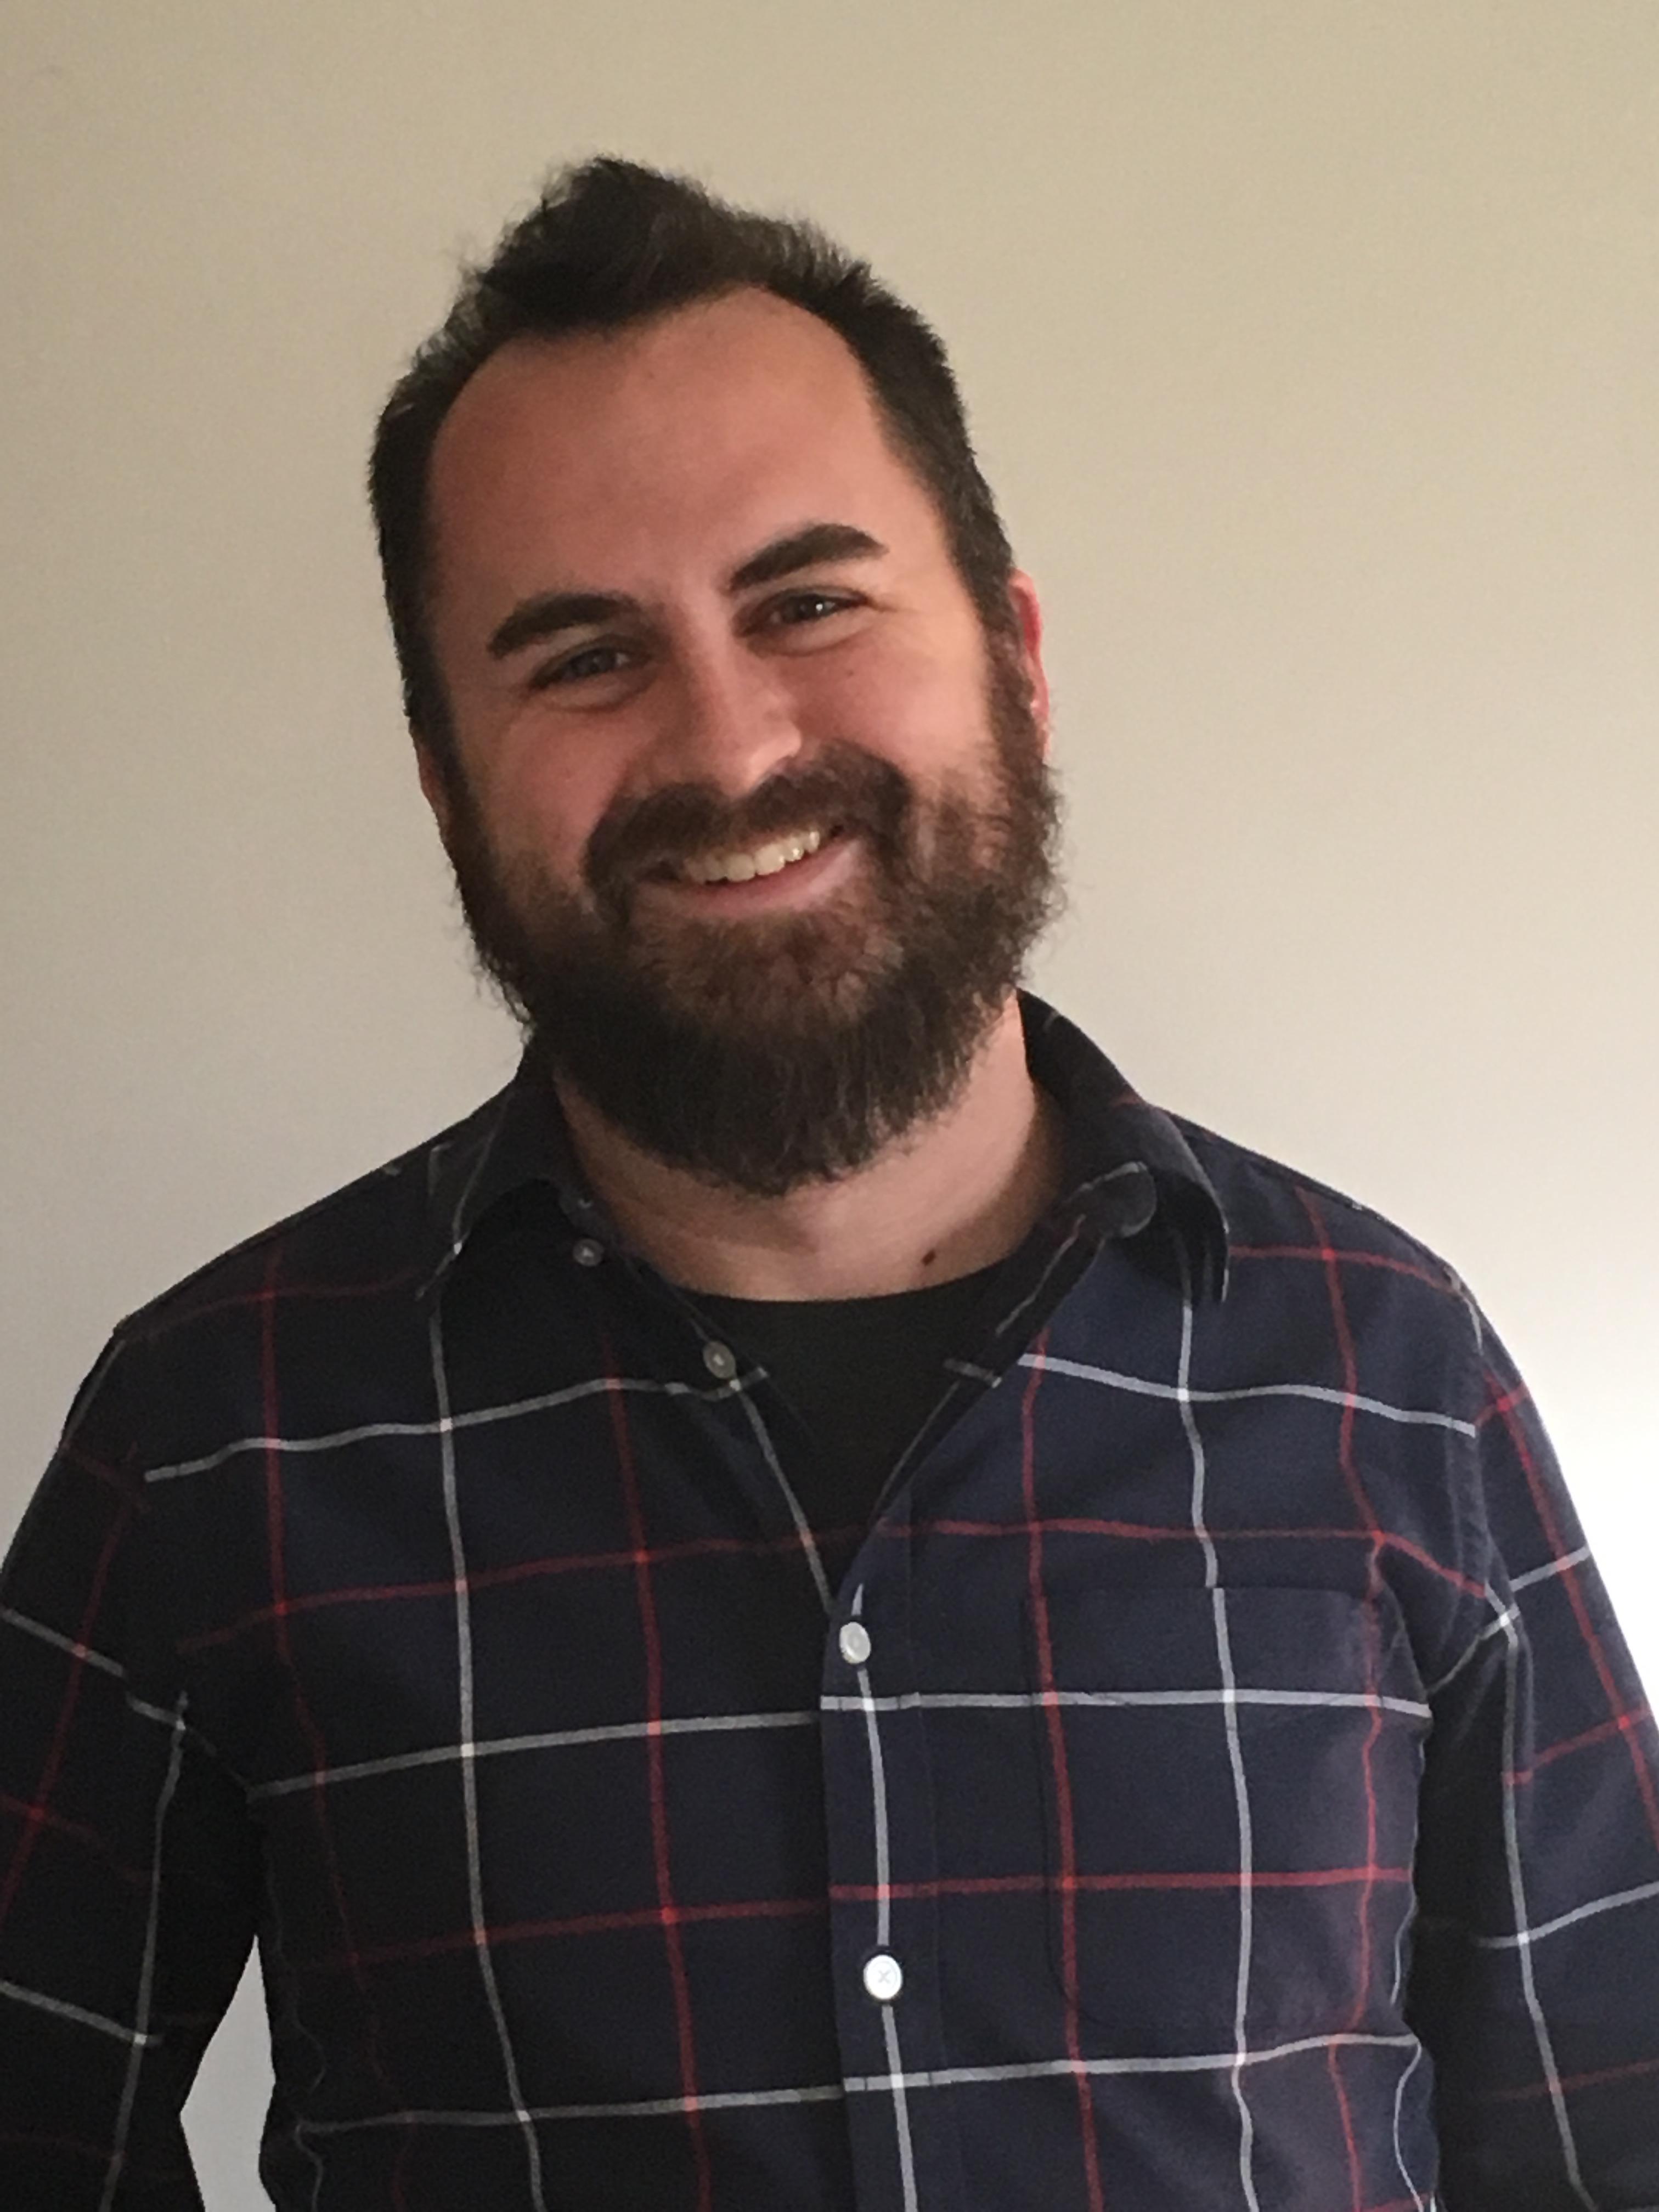 KCAD alumnus Nathan Heuer